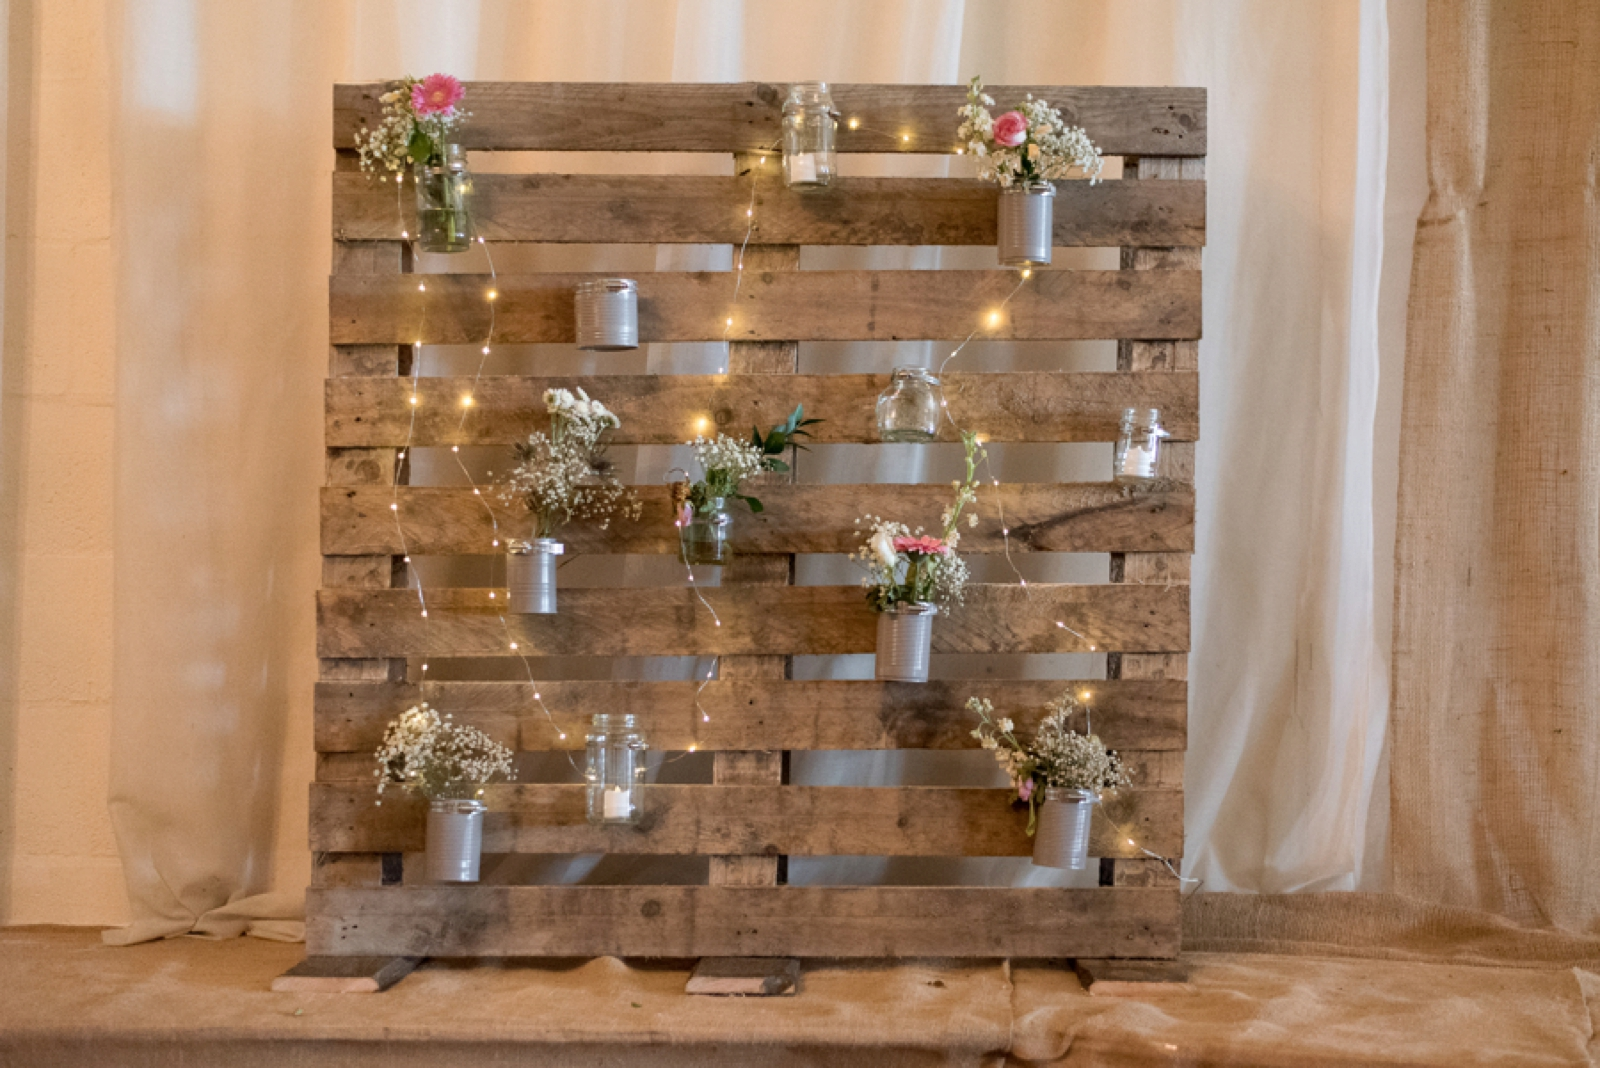 2017-09-23 (Mearns) Pratis Farm Wedding Photography143443.jpg